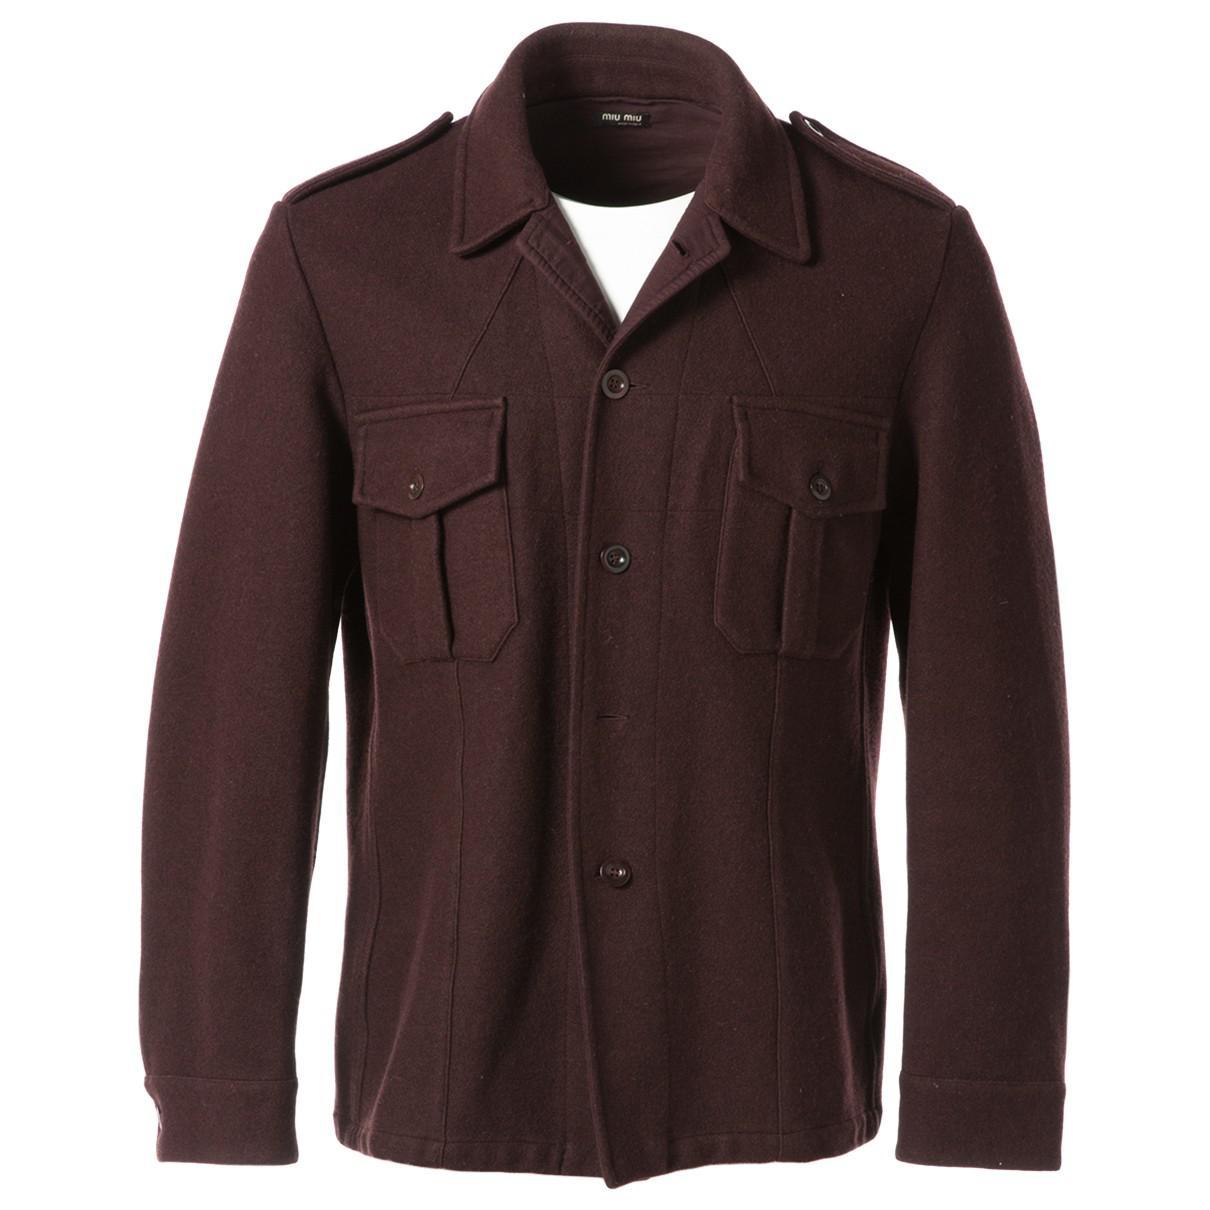 c3ff3fff578 Lyst - Miu Miu Wool Vest in Brown for Men